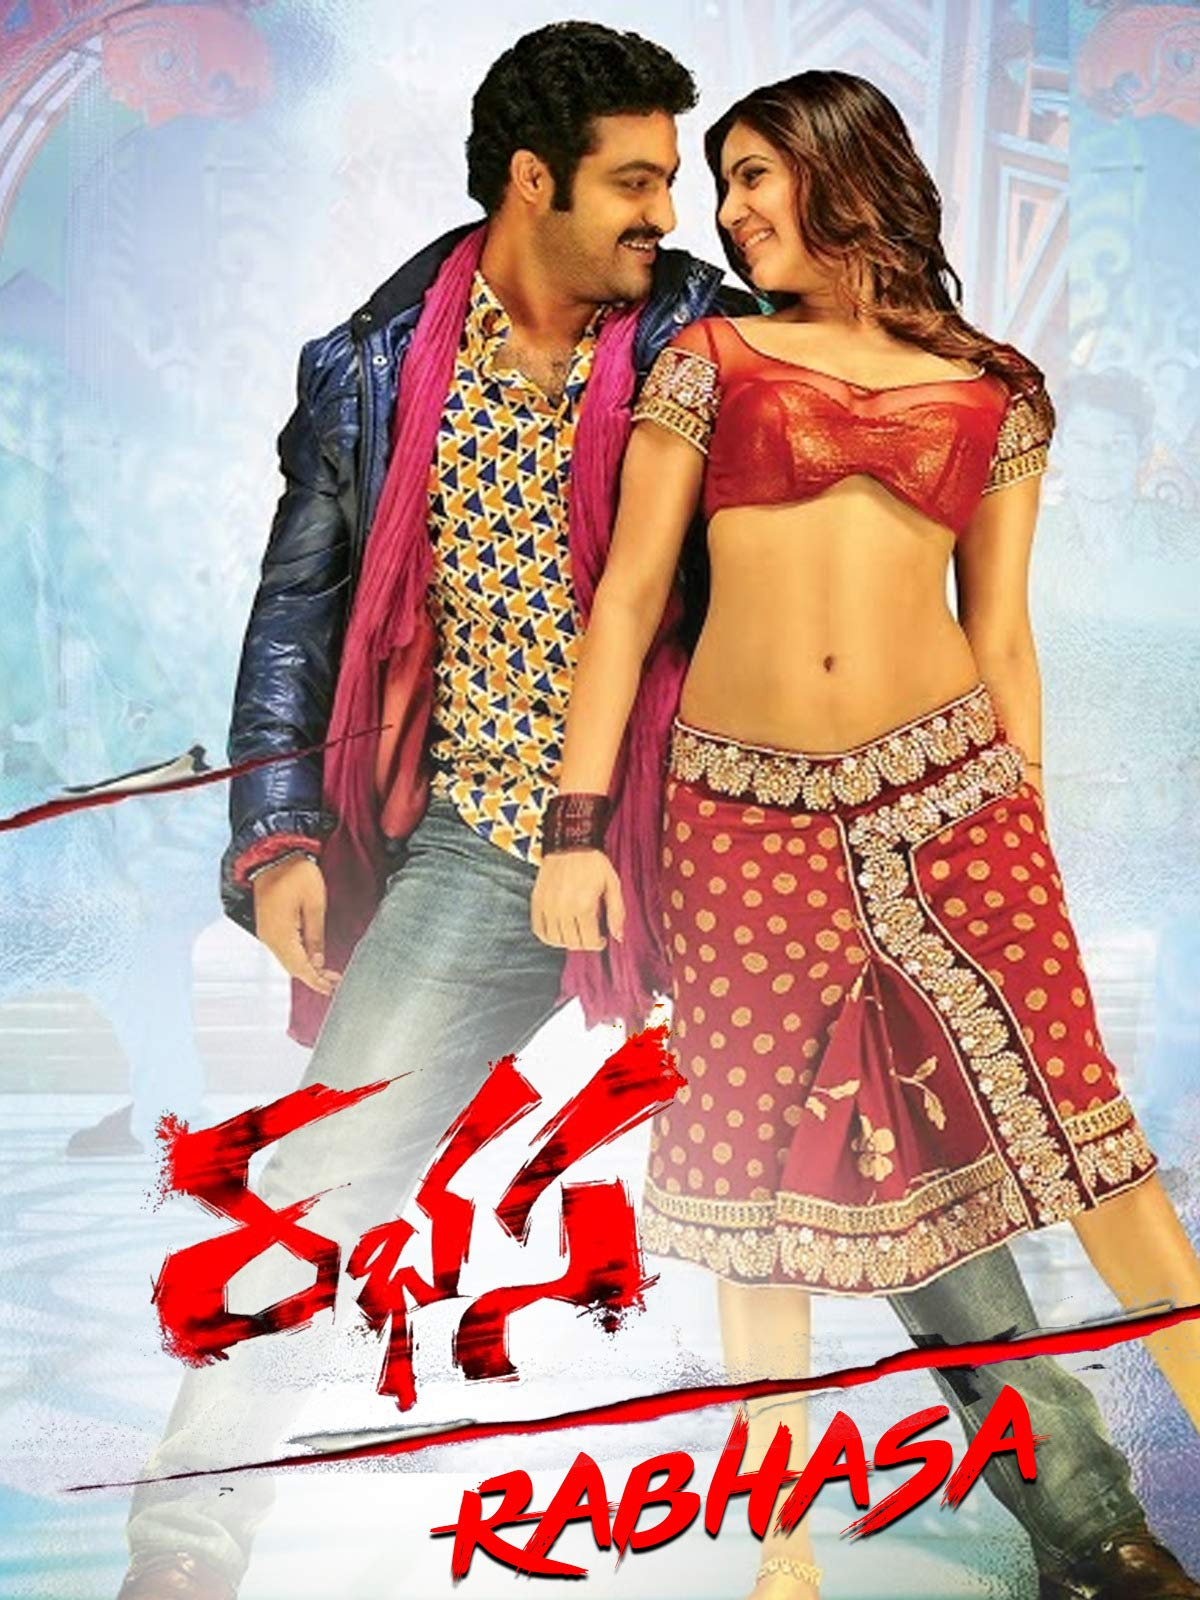 Rabhasa (2014) UNCUT 720p HDRip South Movie [Dual Audio] [Hindi or Telugu] x264 AAC 1.2GB | 500MB Download